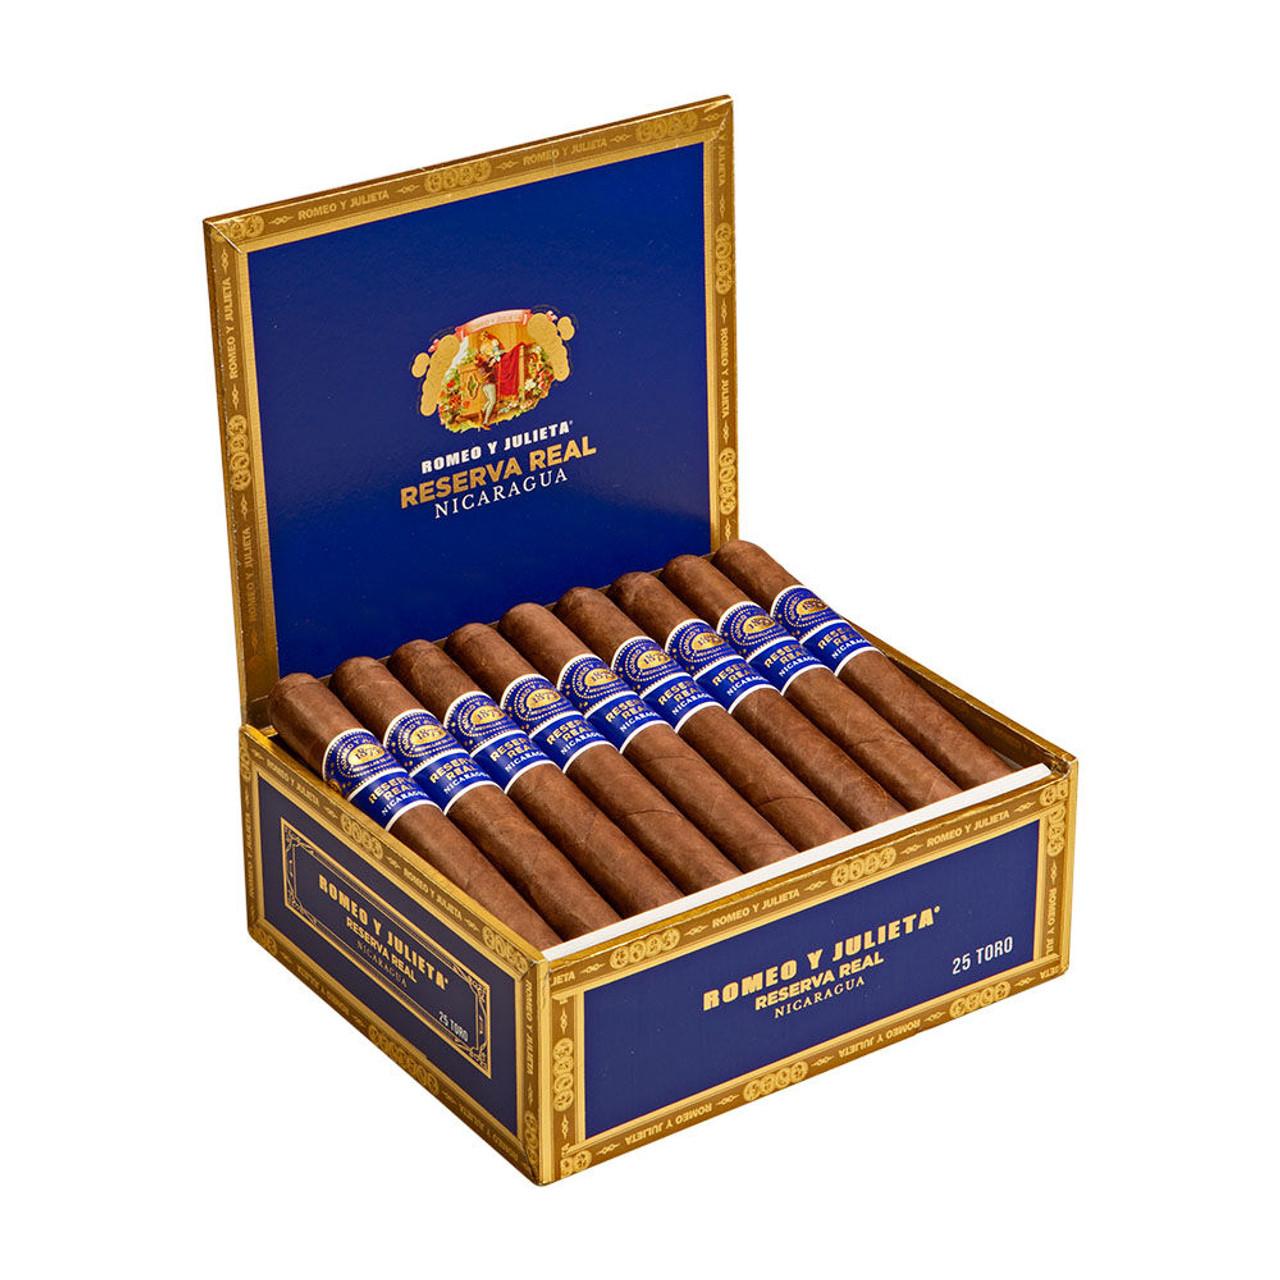 Romeo y Julieta Reserva Real Nicaragua Churchill Cigars - 7 x 50 (Box of 25)